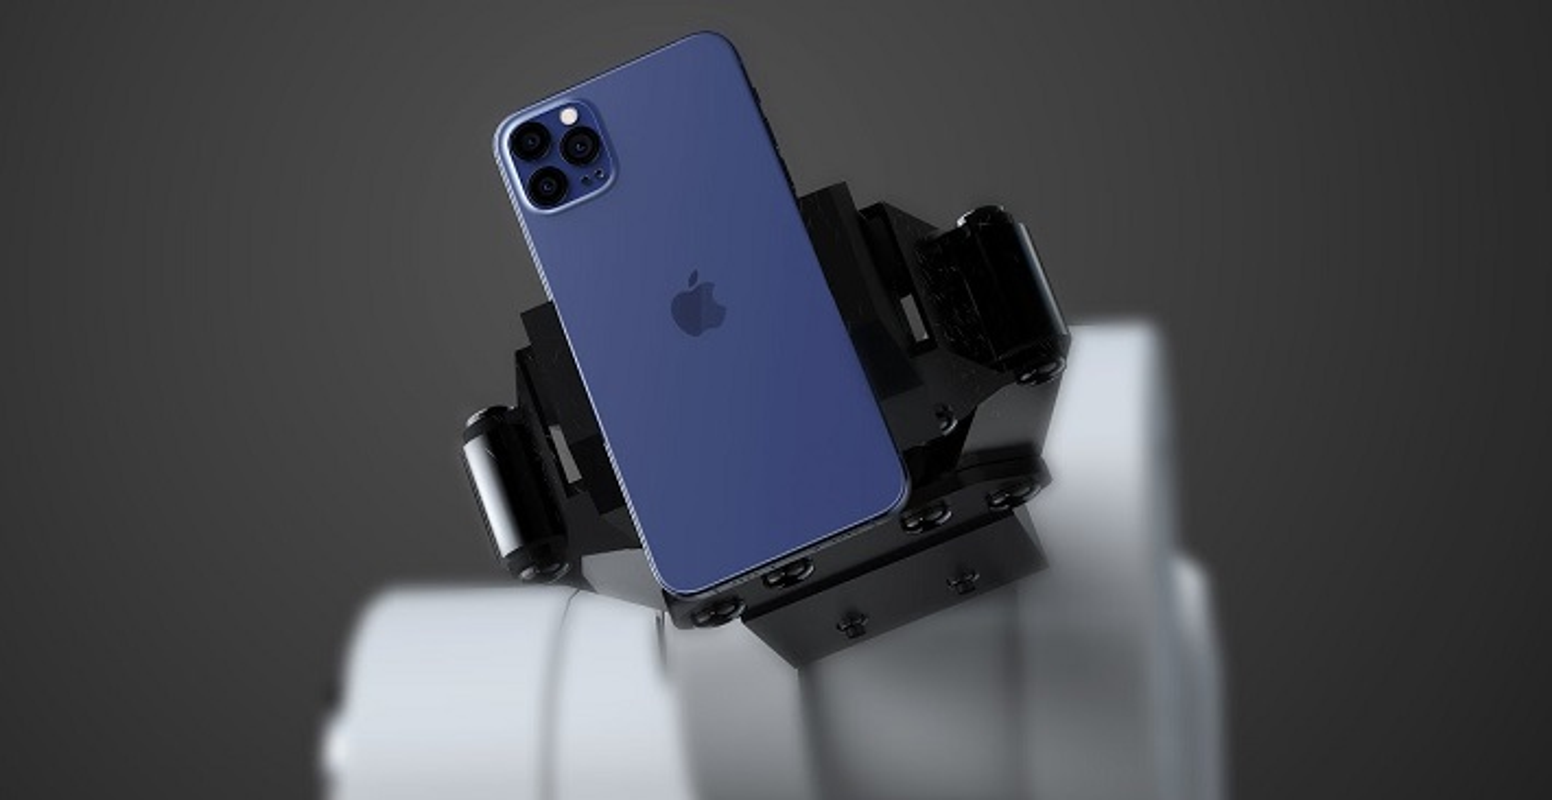 iPhone mini nho nhat tu truoc den nay xuat hien cung iPhone 12-Hinh-2